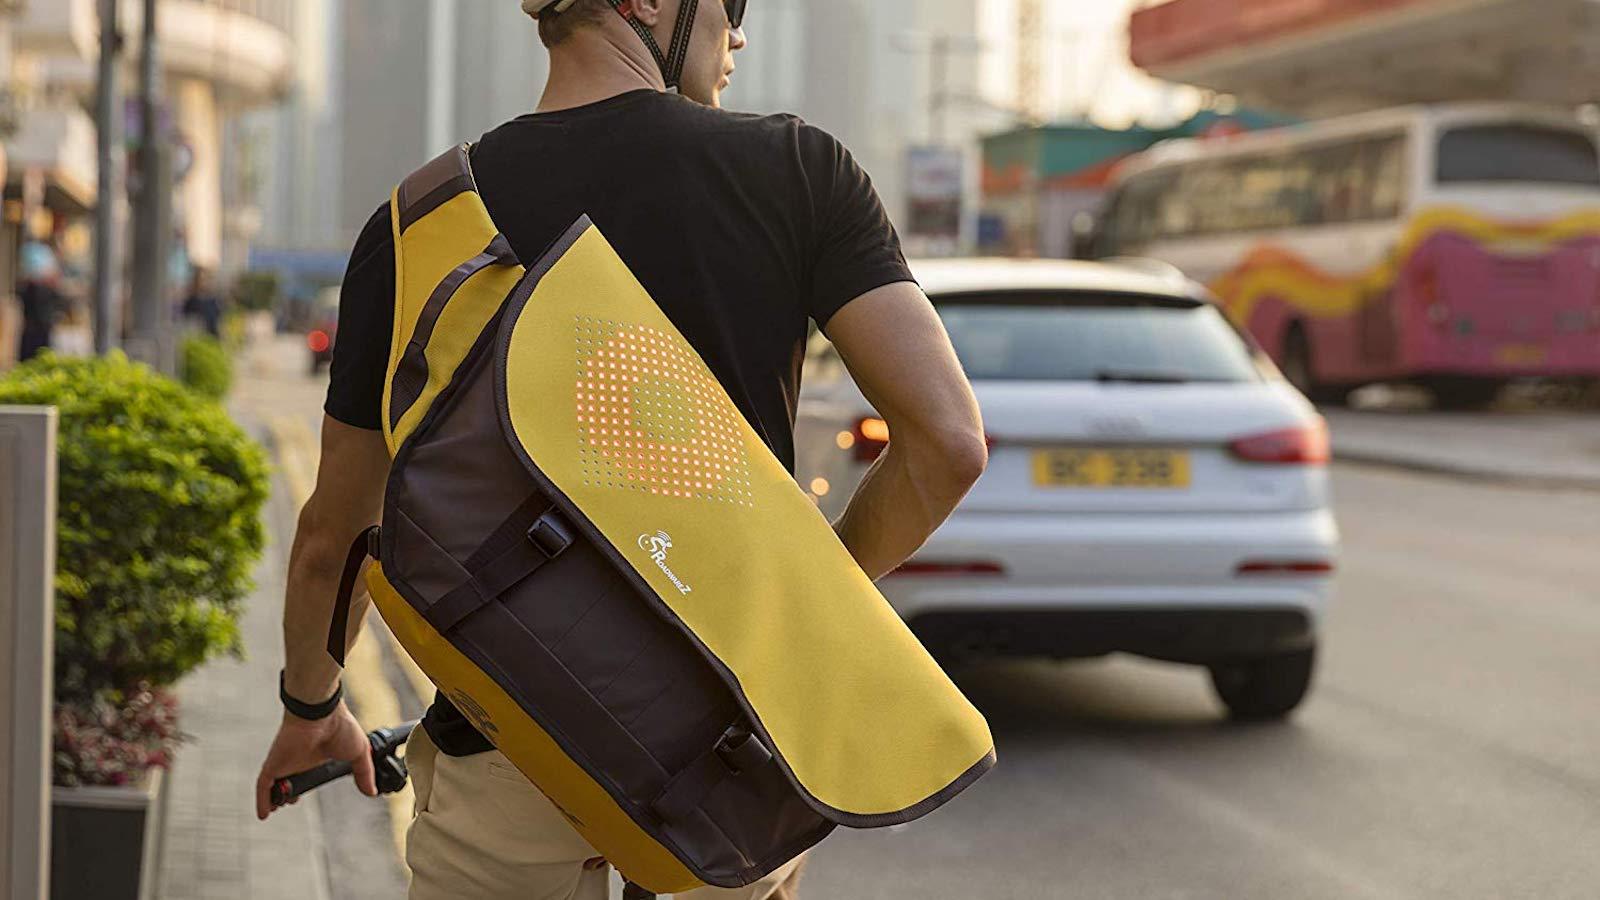 Roadwarez Cruiser Smart Cycling Backpack displays 256 customizable color LEDs